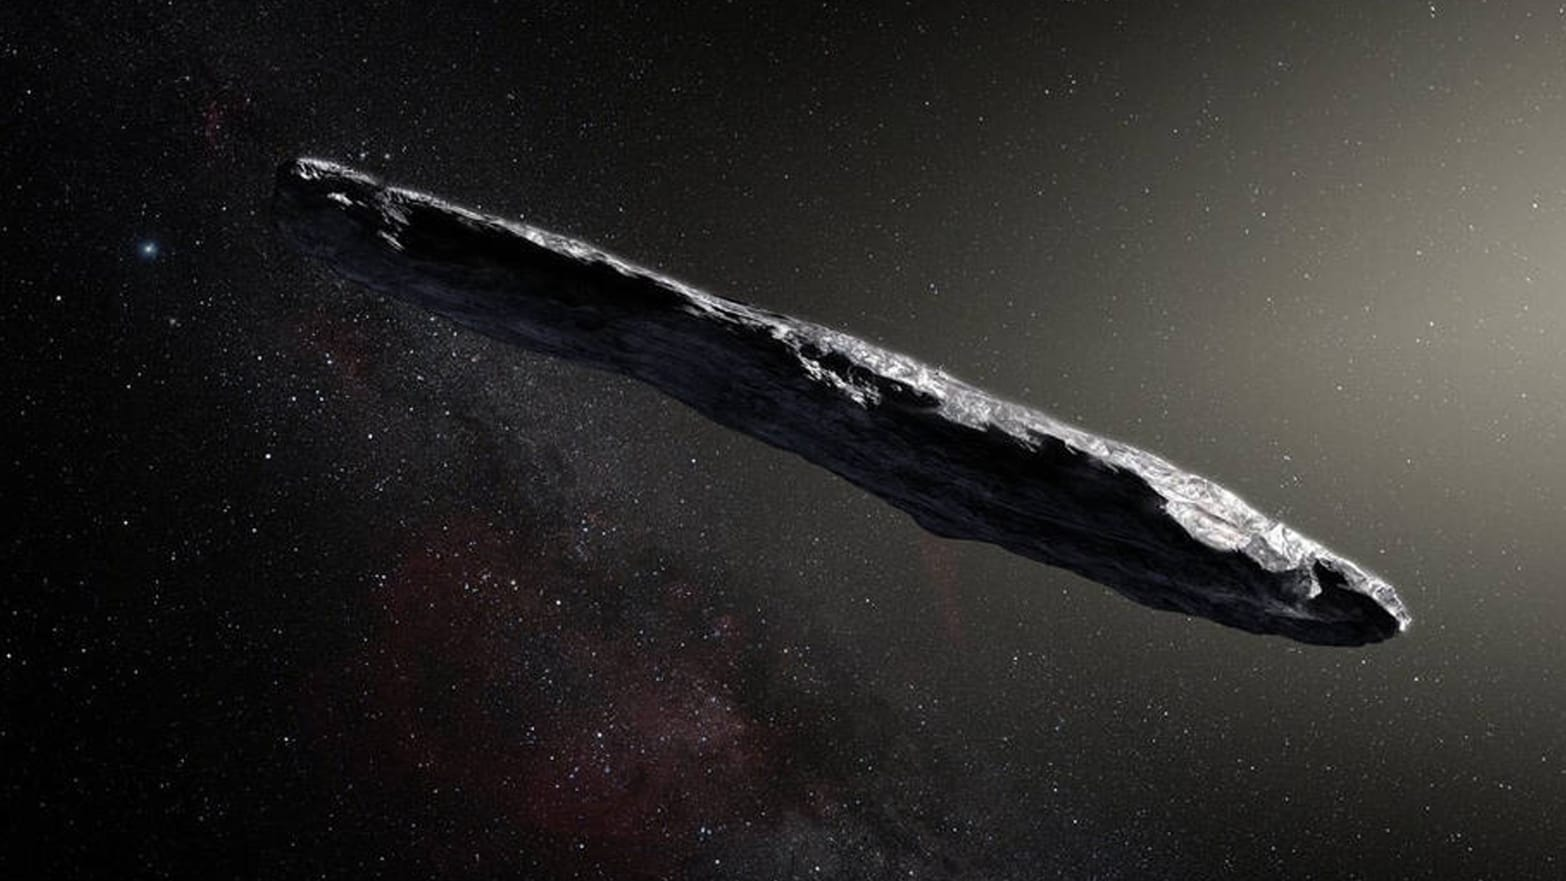 oumuamua artist rendition abraham avi loeb shmuel bialy paul sutter astrphysics comet asteroid solar radiation pressure